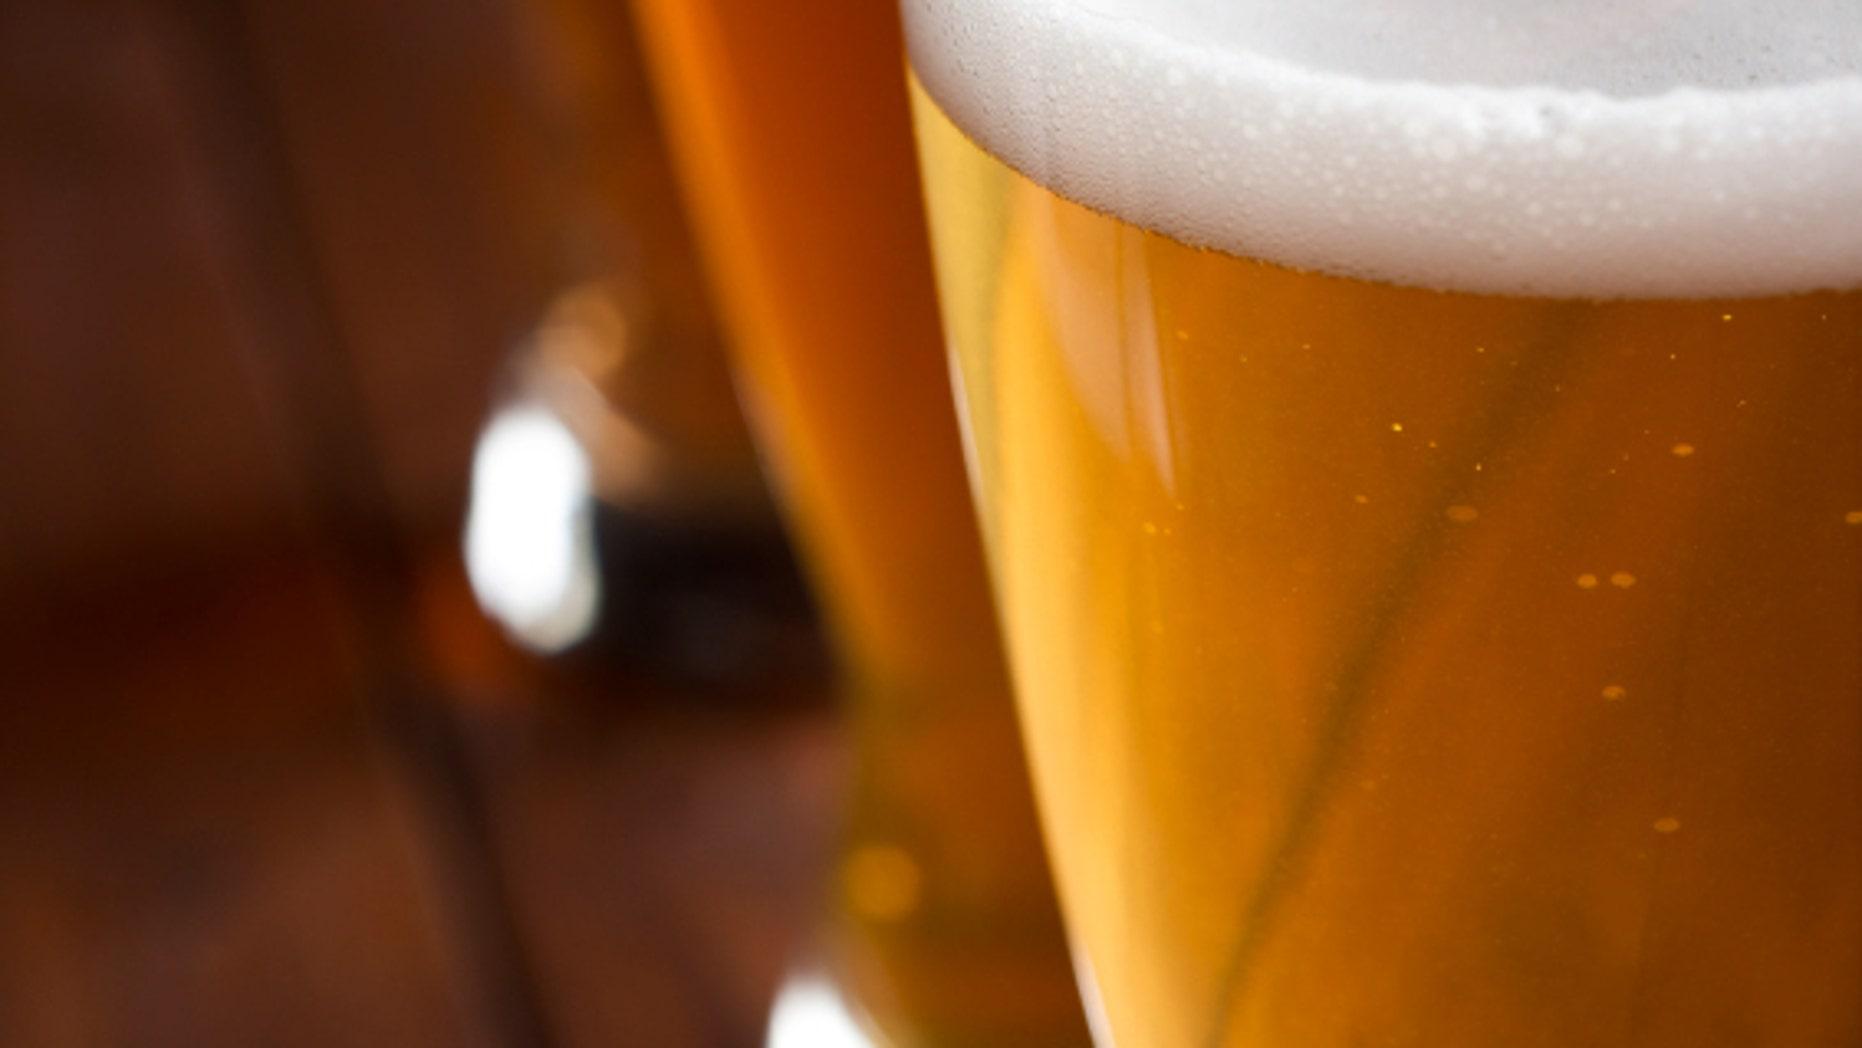 Beer foam has a scientific purpose.